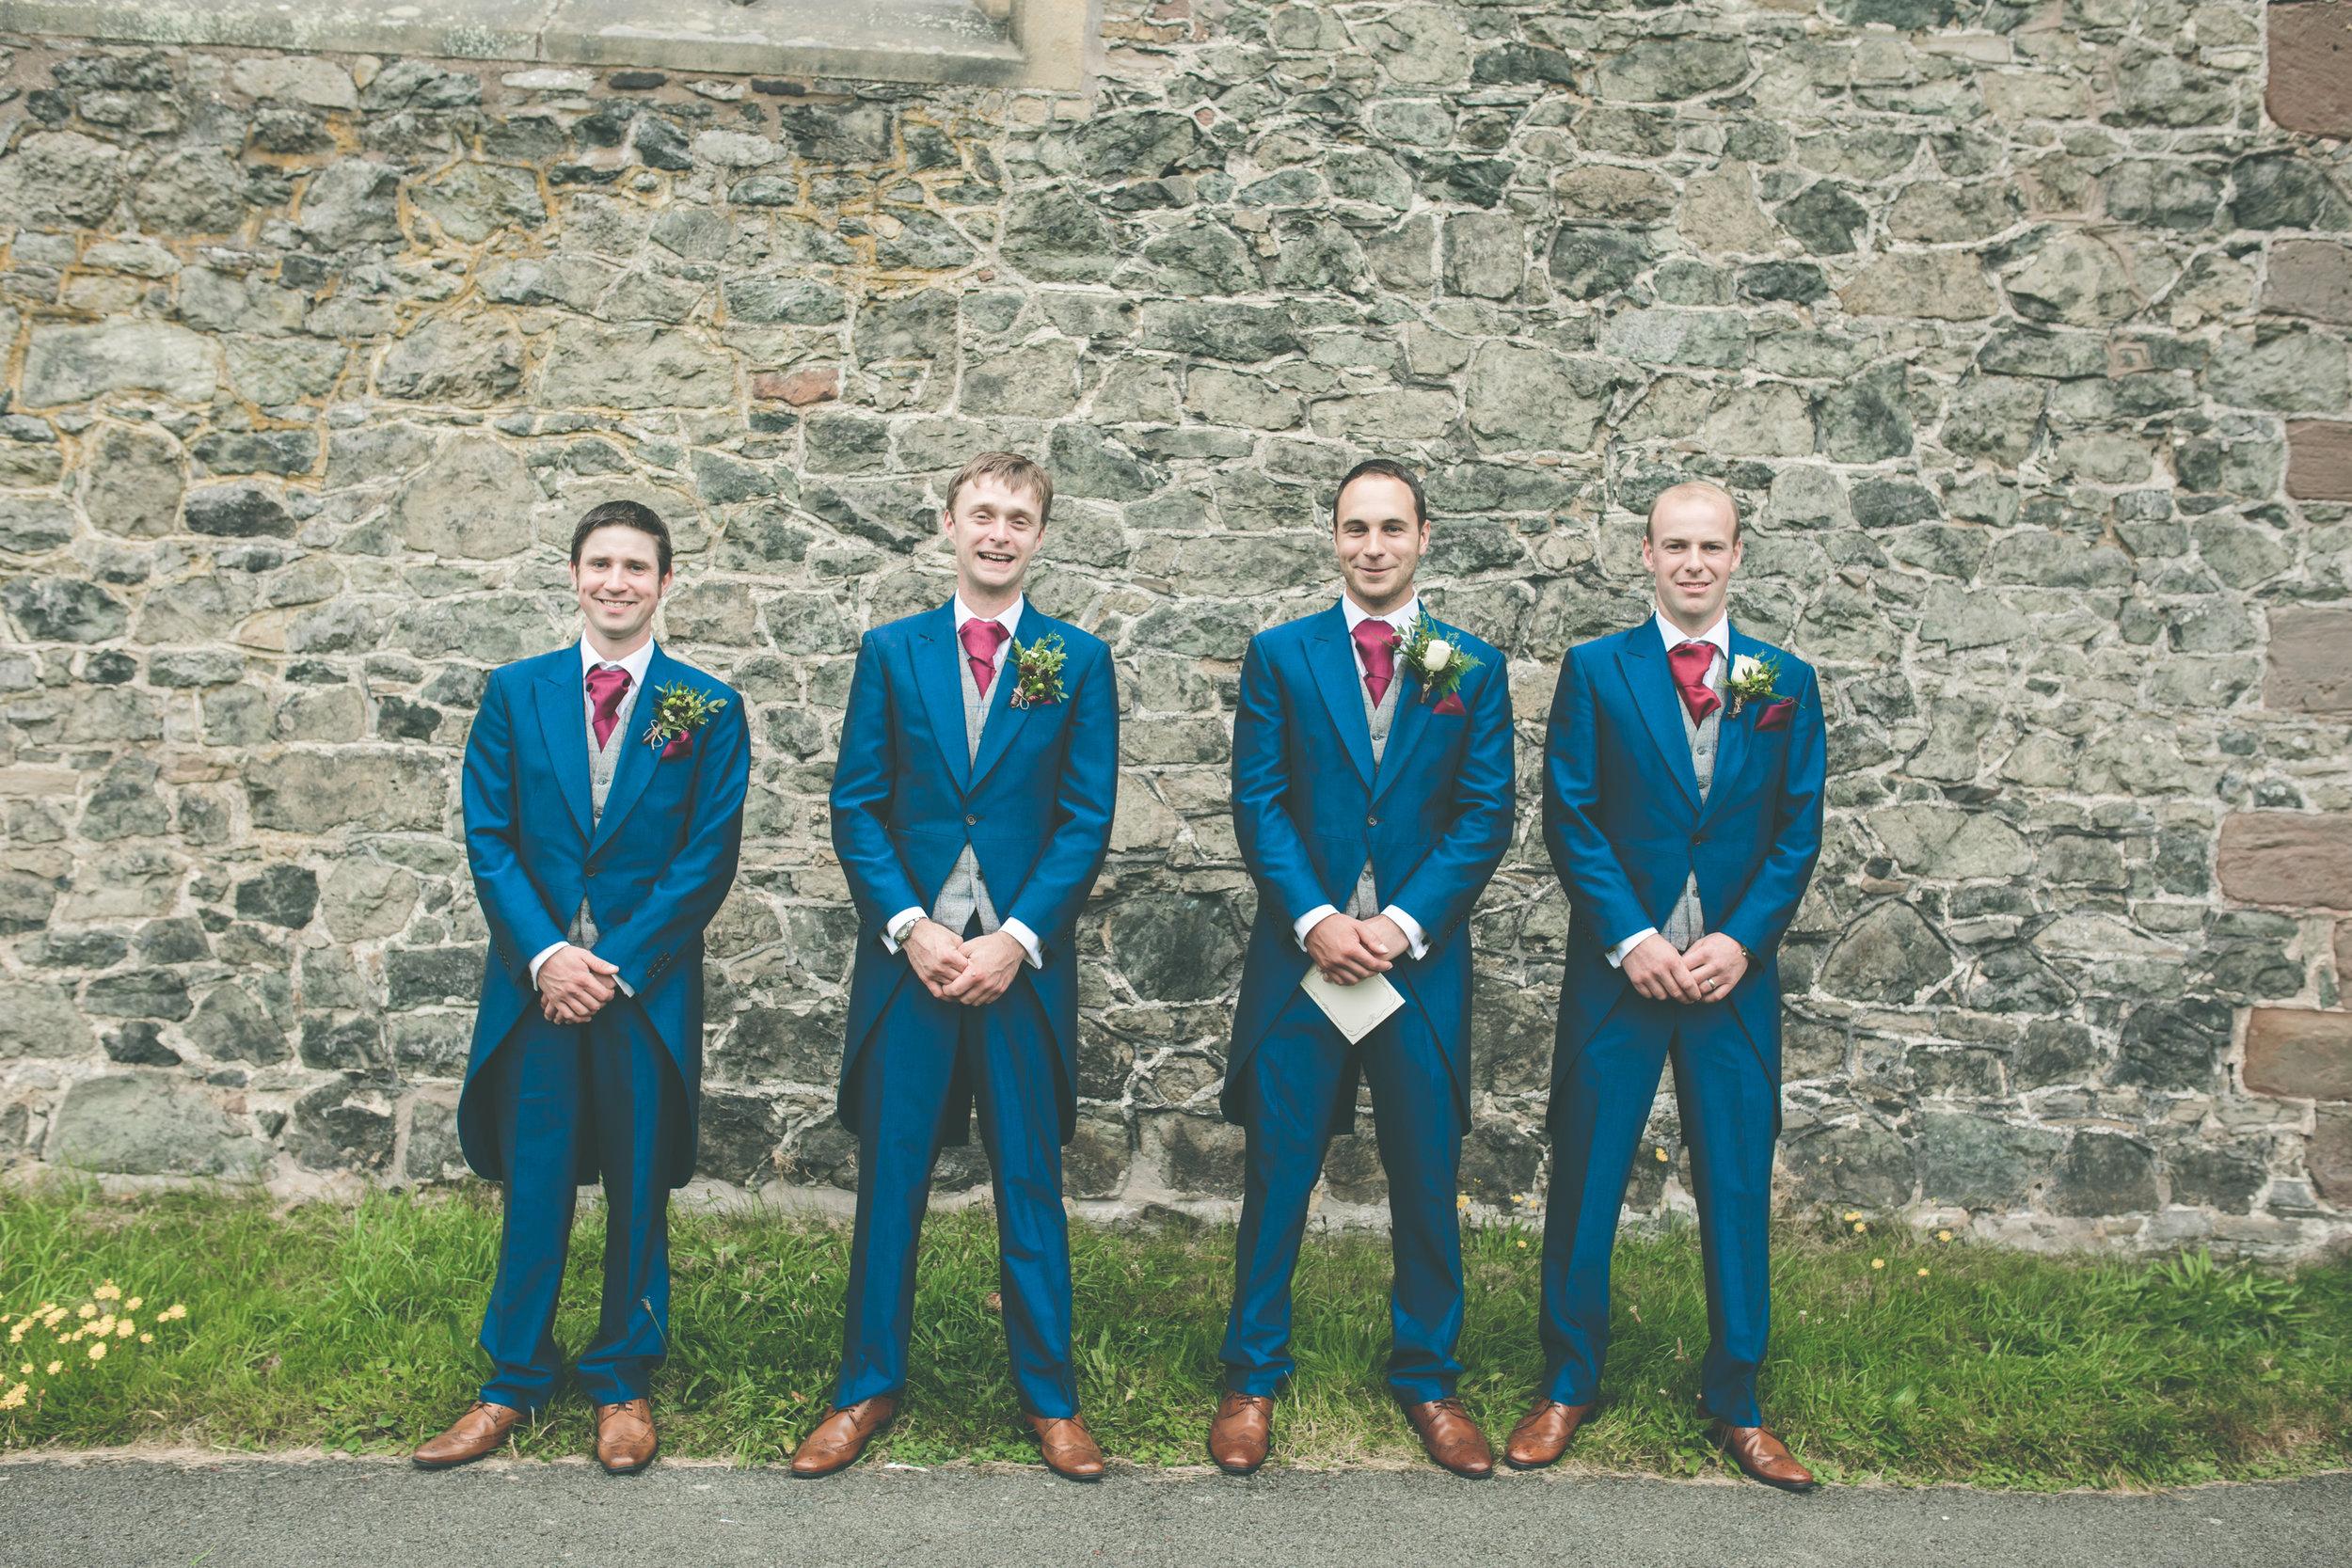 Groom and groomsmen, Montgomery church wedding photography